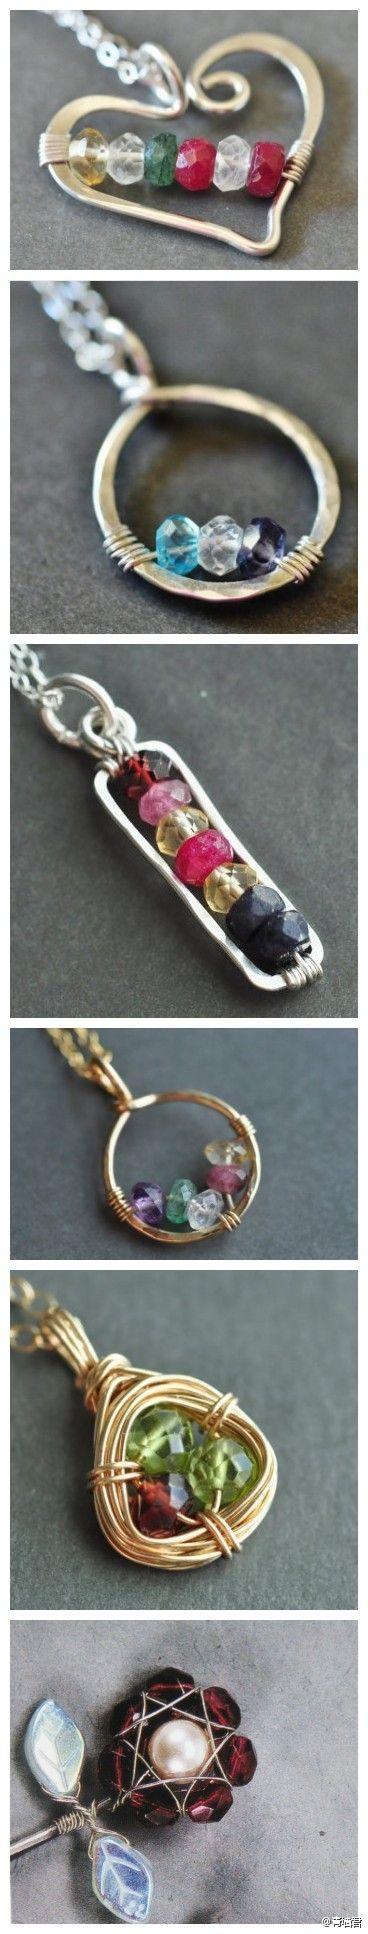 Birthstone necklace ideas